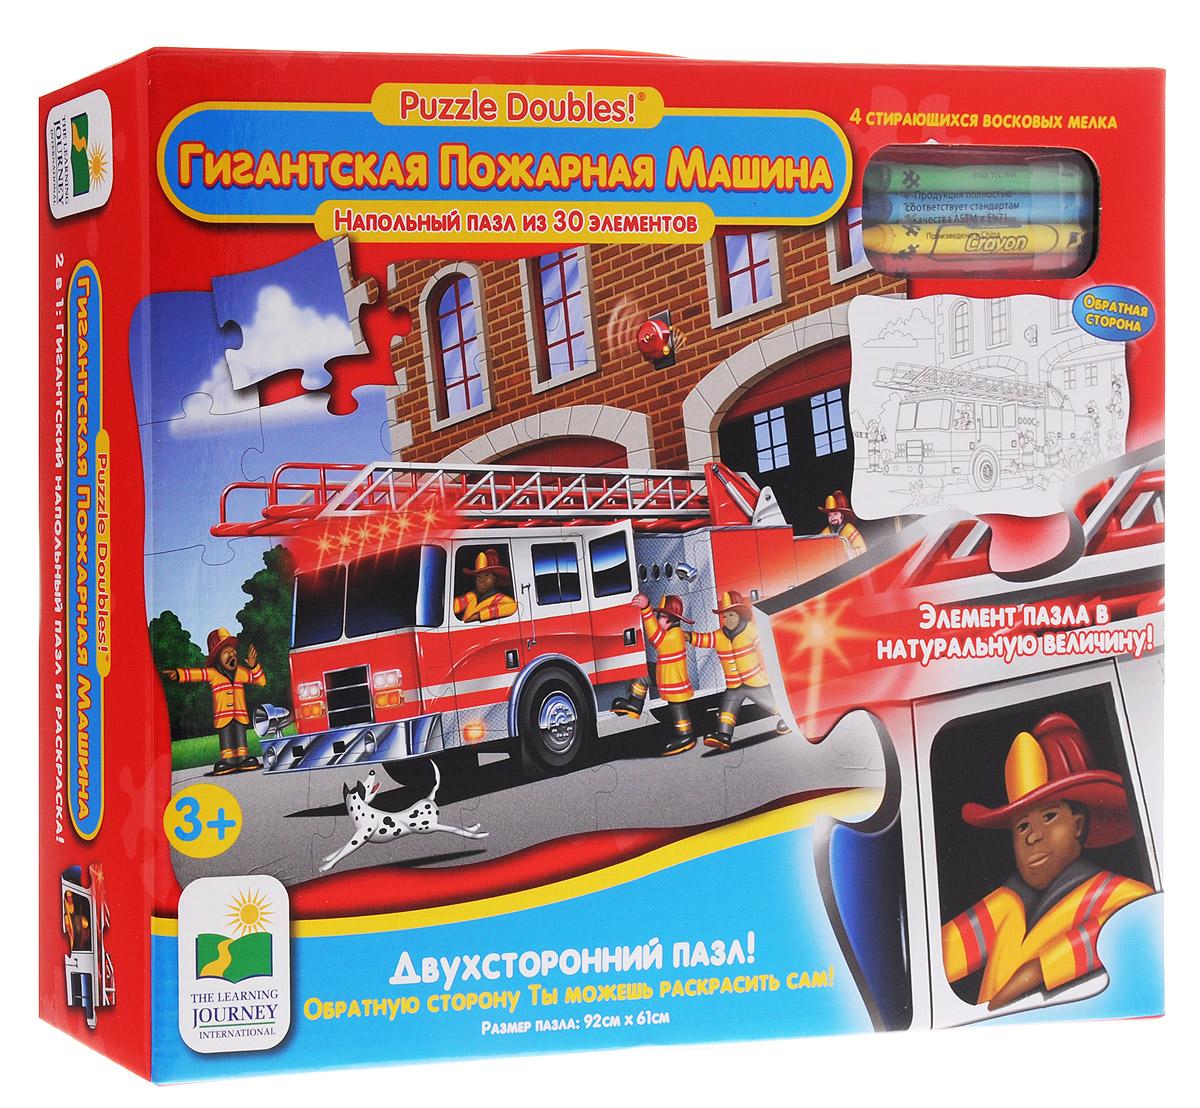 Learning Journey Пазл для малышей Гигантская пожарная машина learning journey гигантская пожарная машина 30 элементов двухсторонний 699546